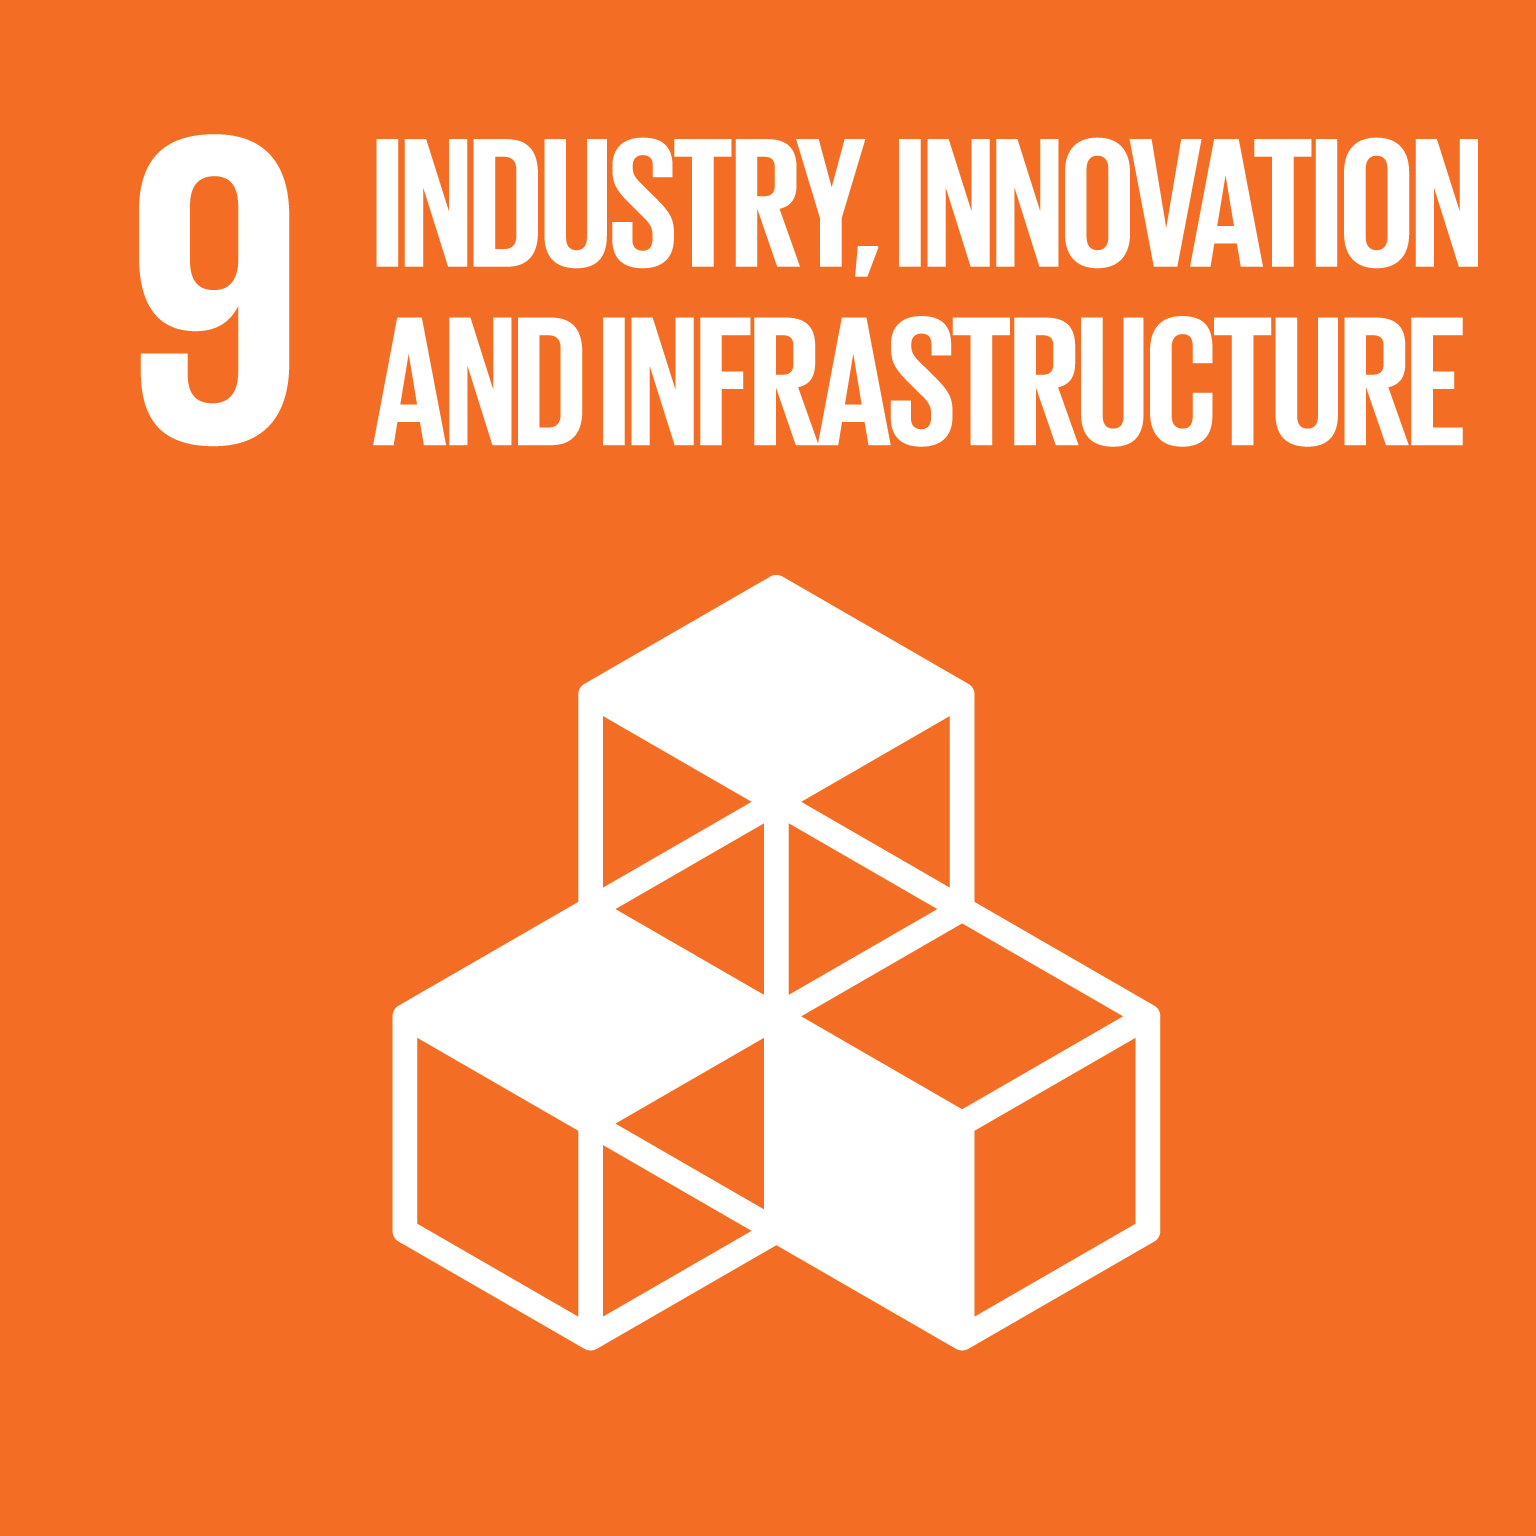 Goal 9 Sustainable Development Knowledge Platform